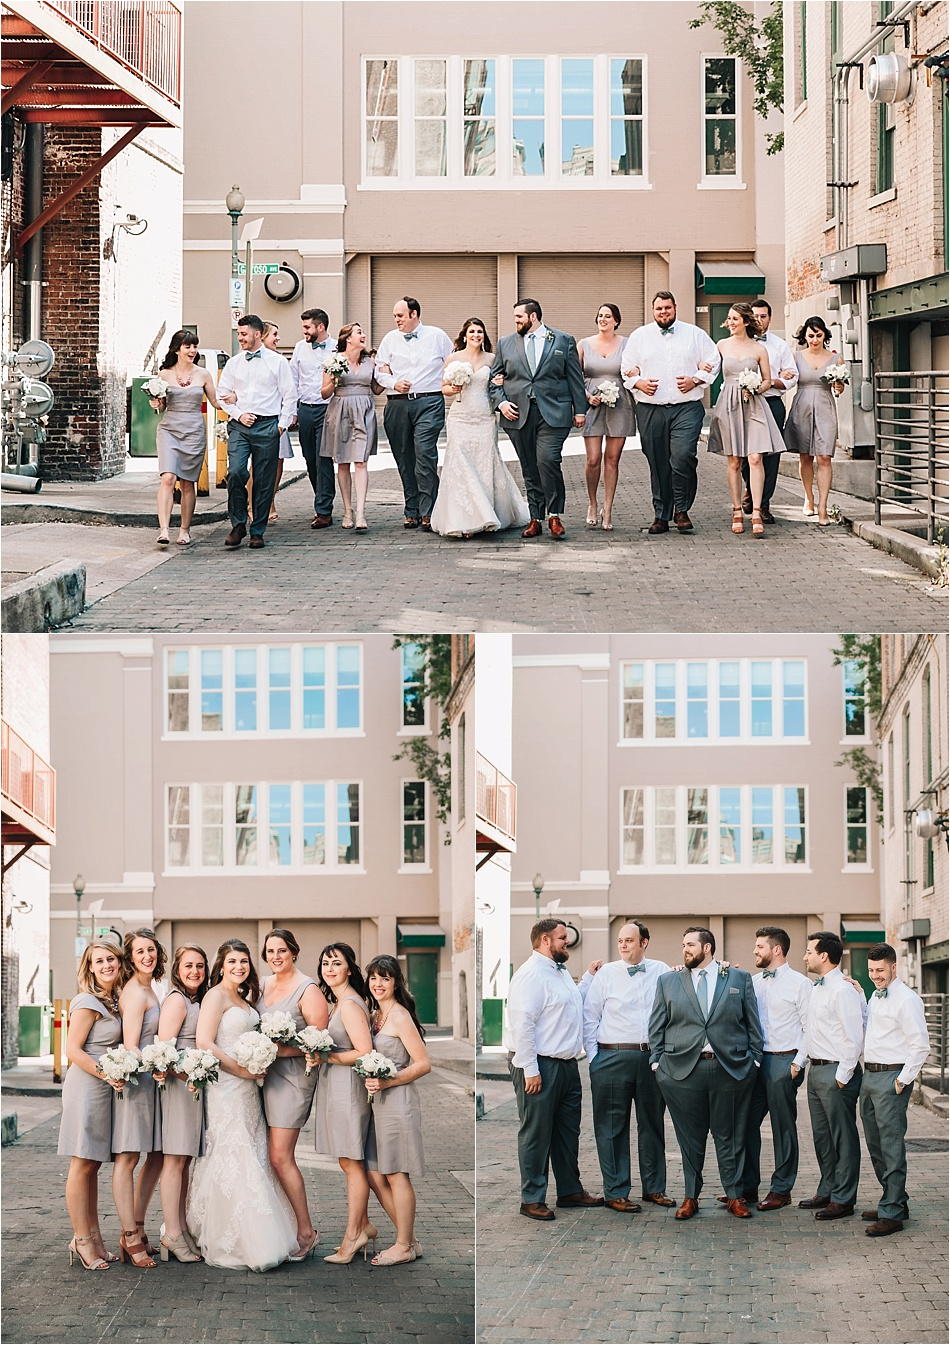 CK-Photo-Nashville-Wedding-Photographer-_0010.jpg